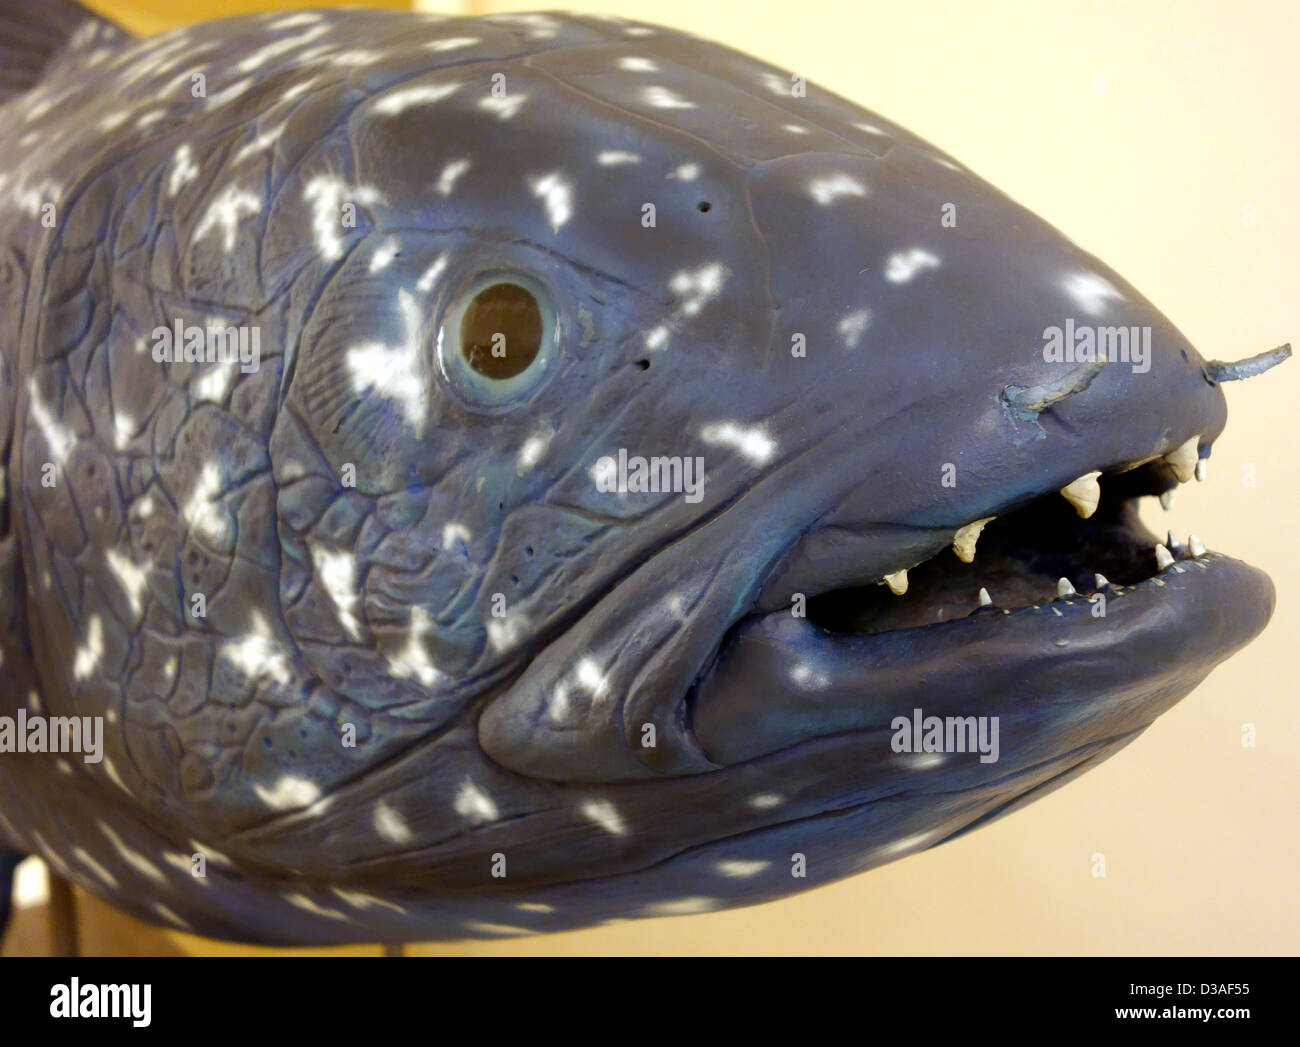 Model of extinct Coelacanth fish in museum in Santa Cruz de Tenerife, Canary Islands - Stock Image